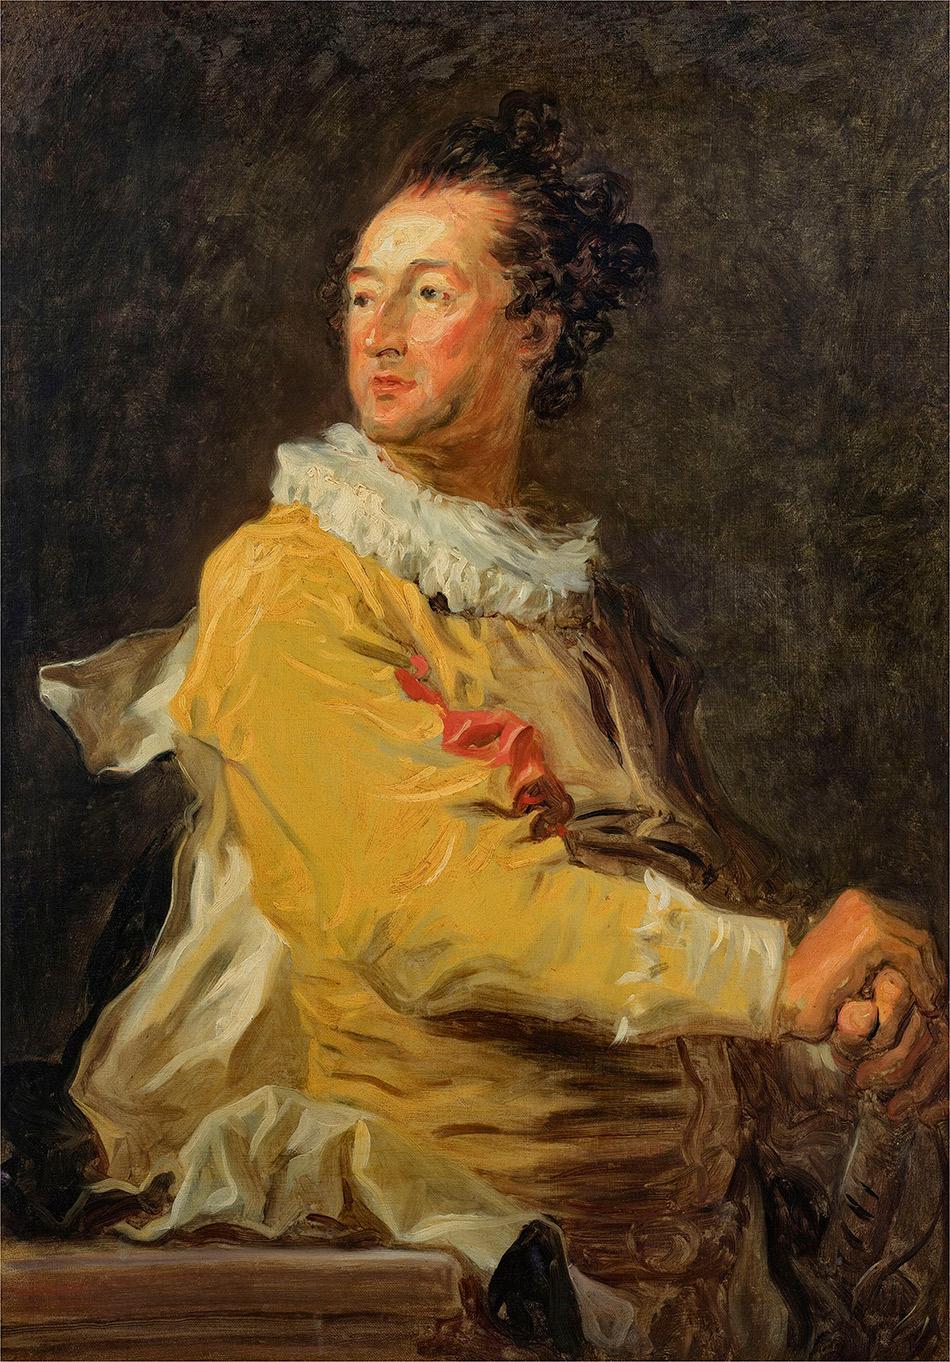 Jean-Honore-Fragonard_Anne-Francois-dHarcourt_duc-de-Beuvron_w